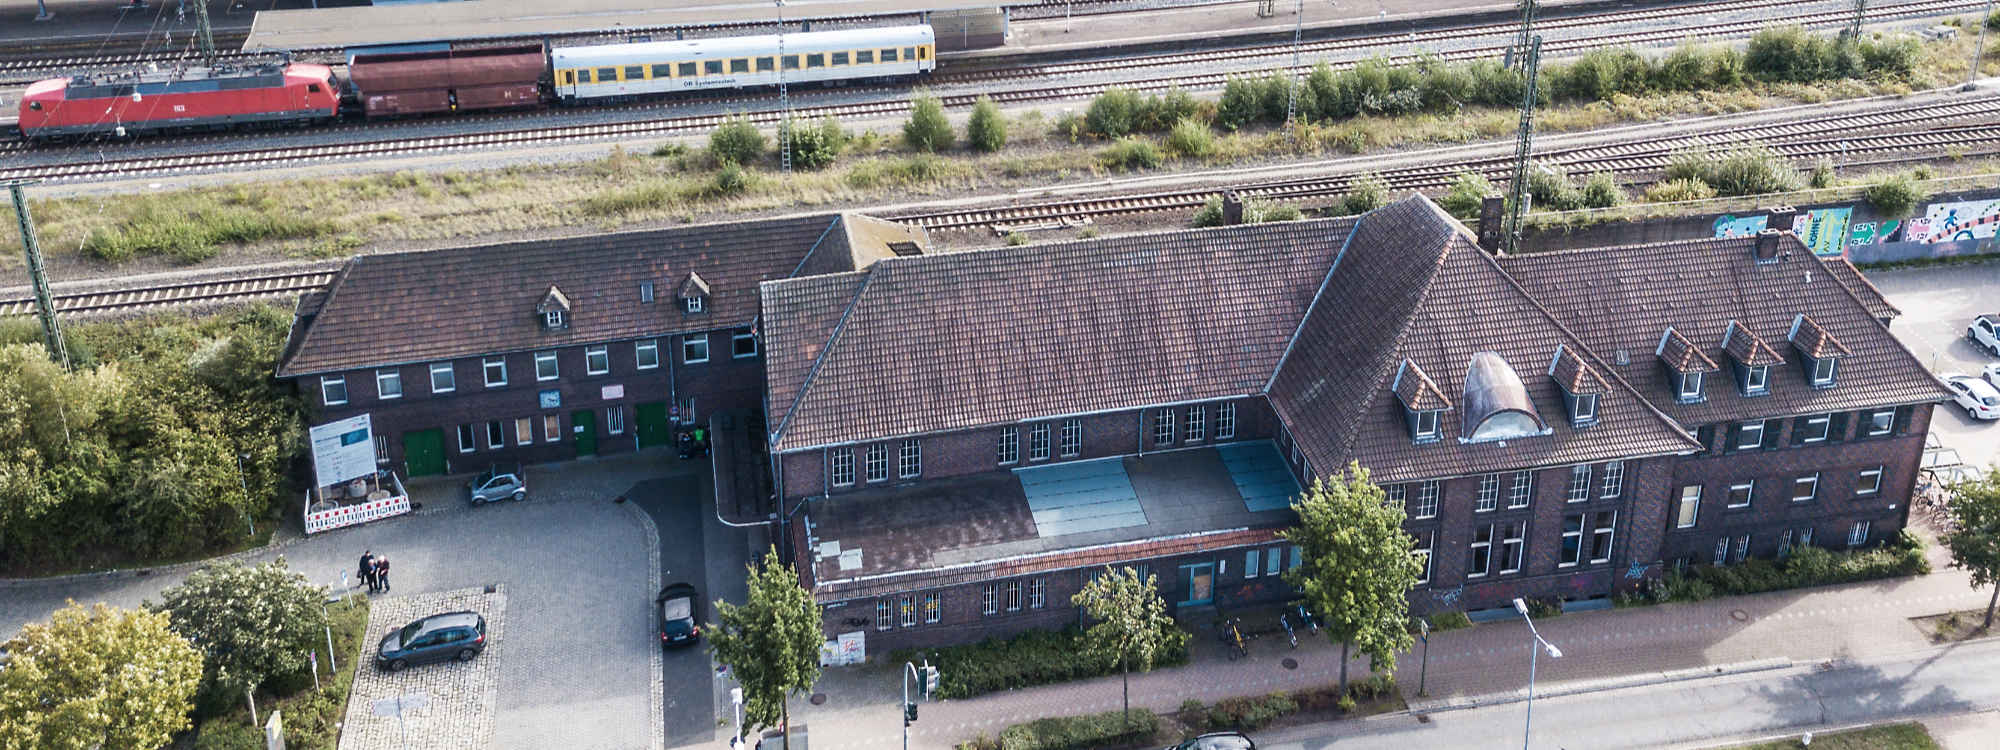 Löhne Bahnhof